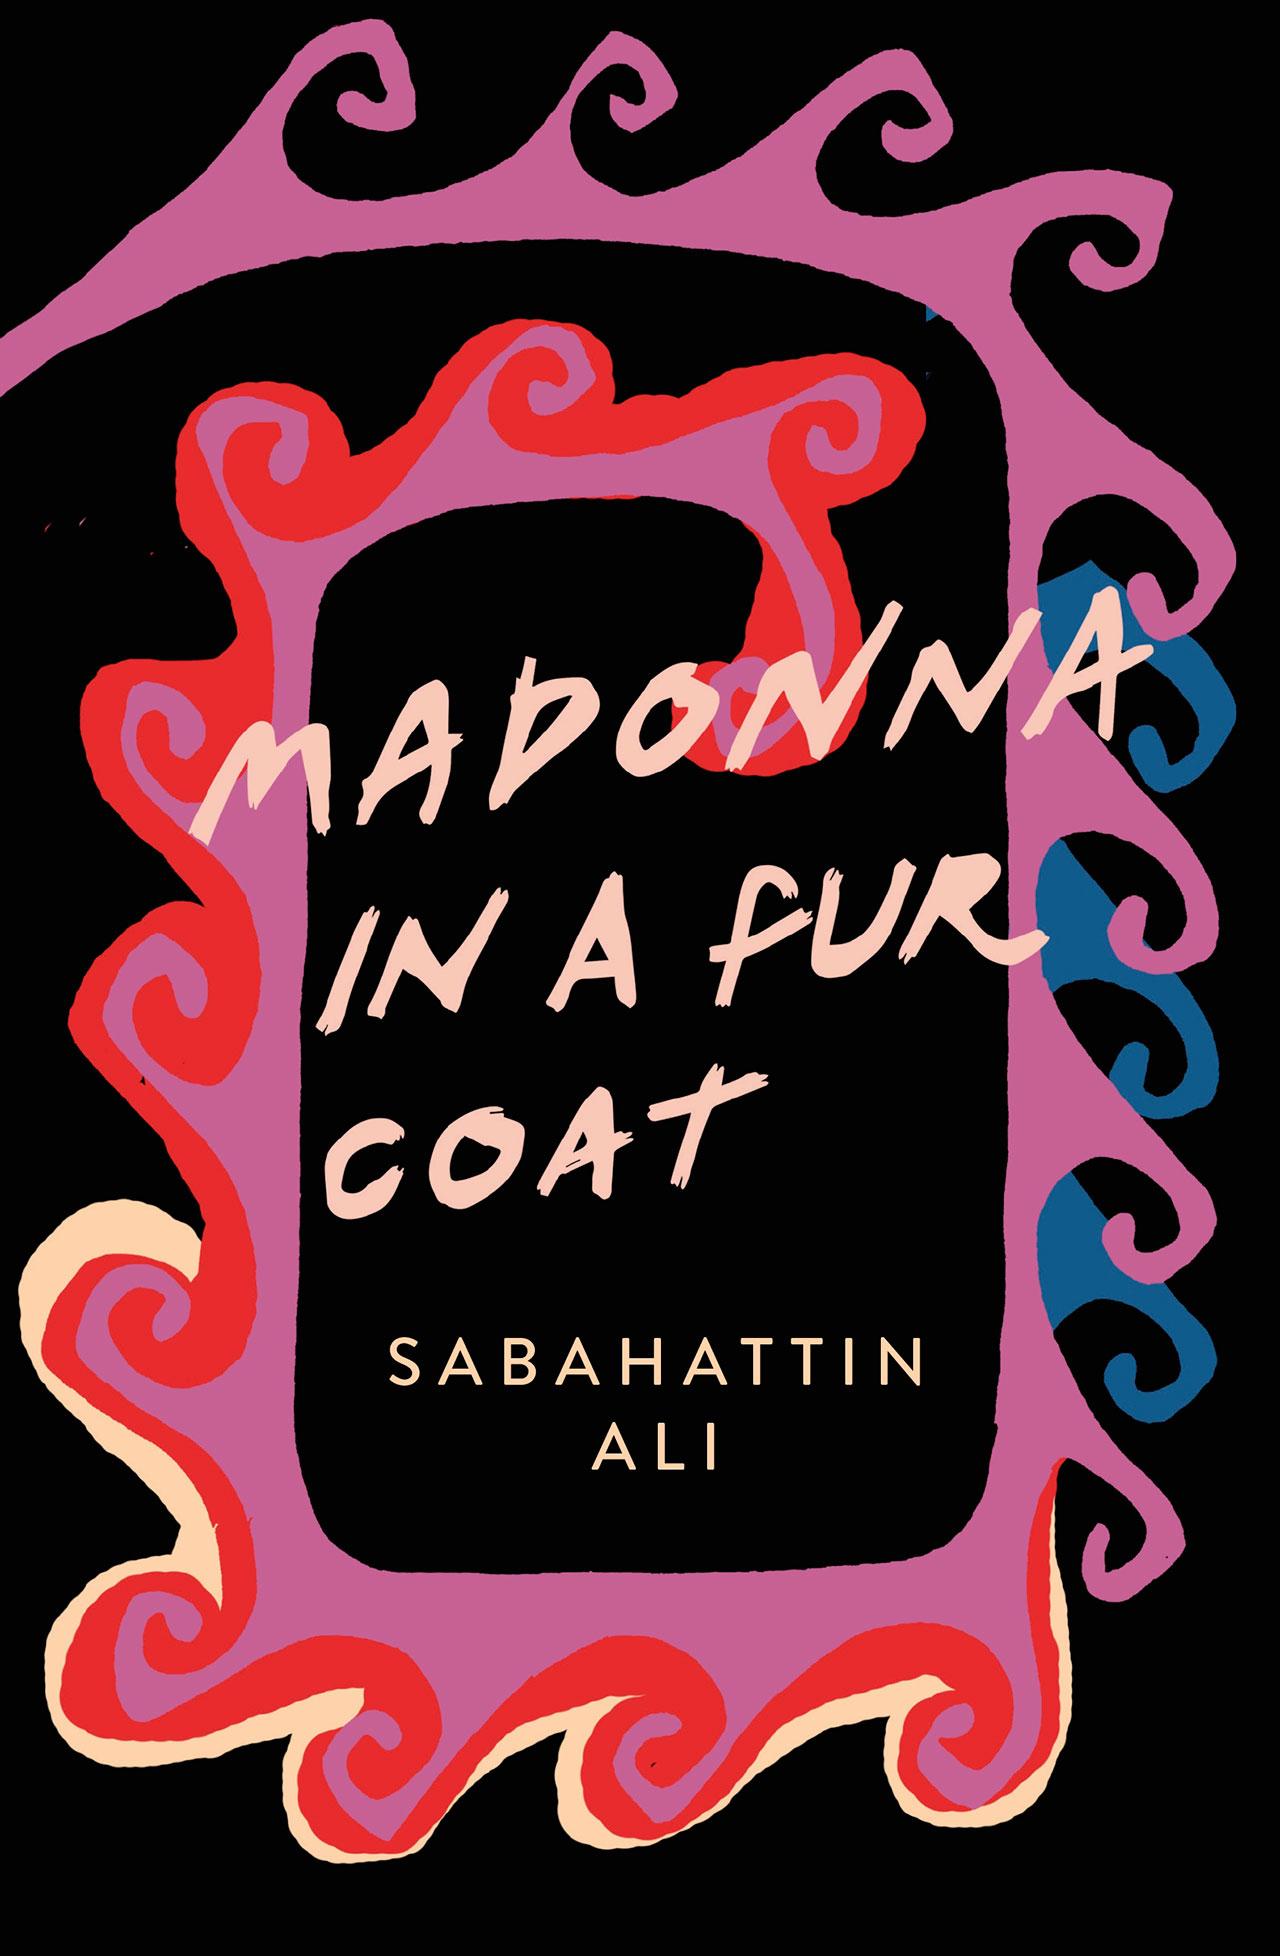 Sabahattin Ali, Madonna in a fur coat, book cover.